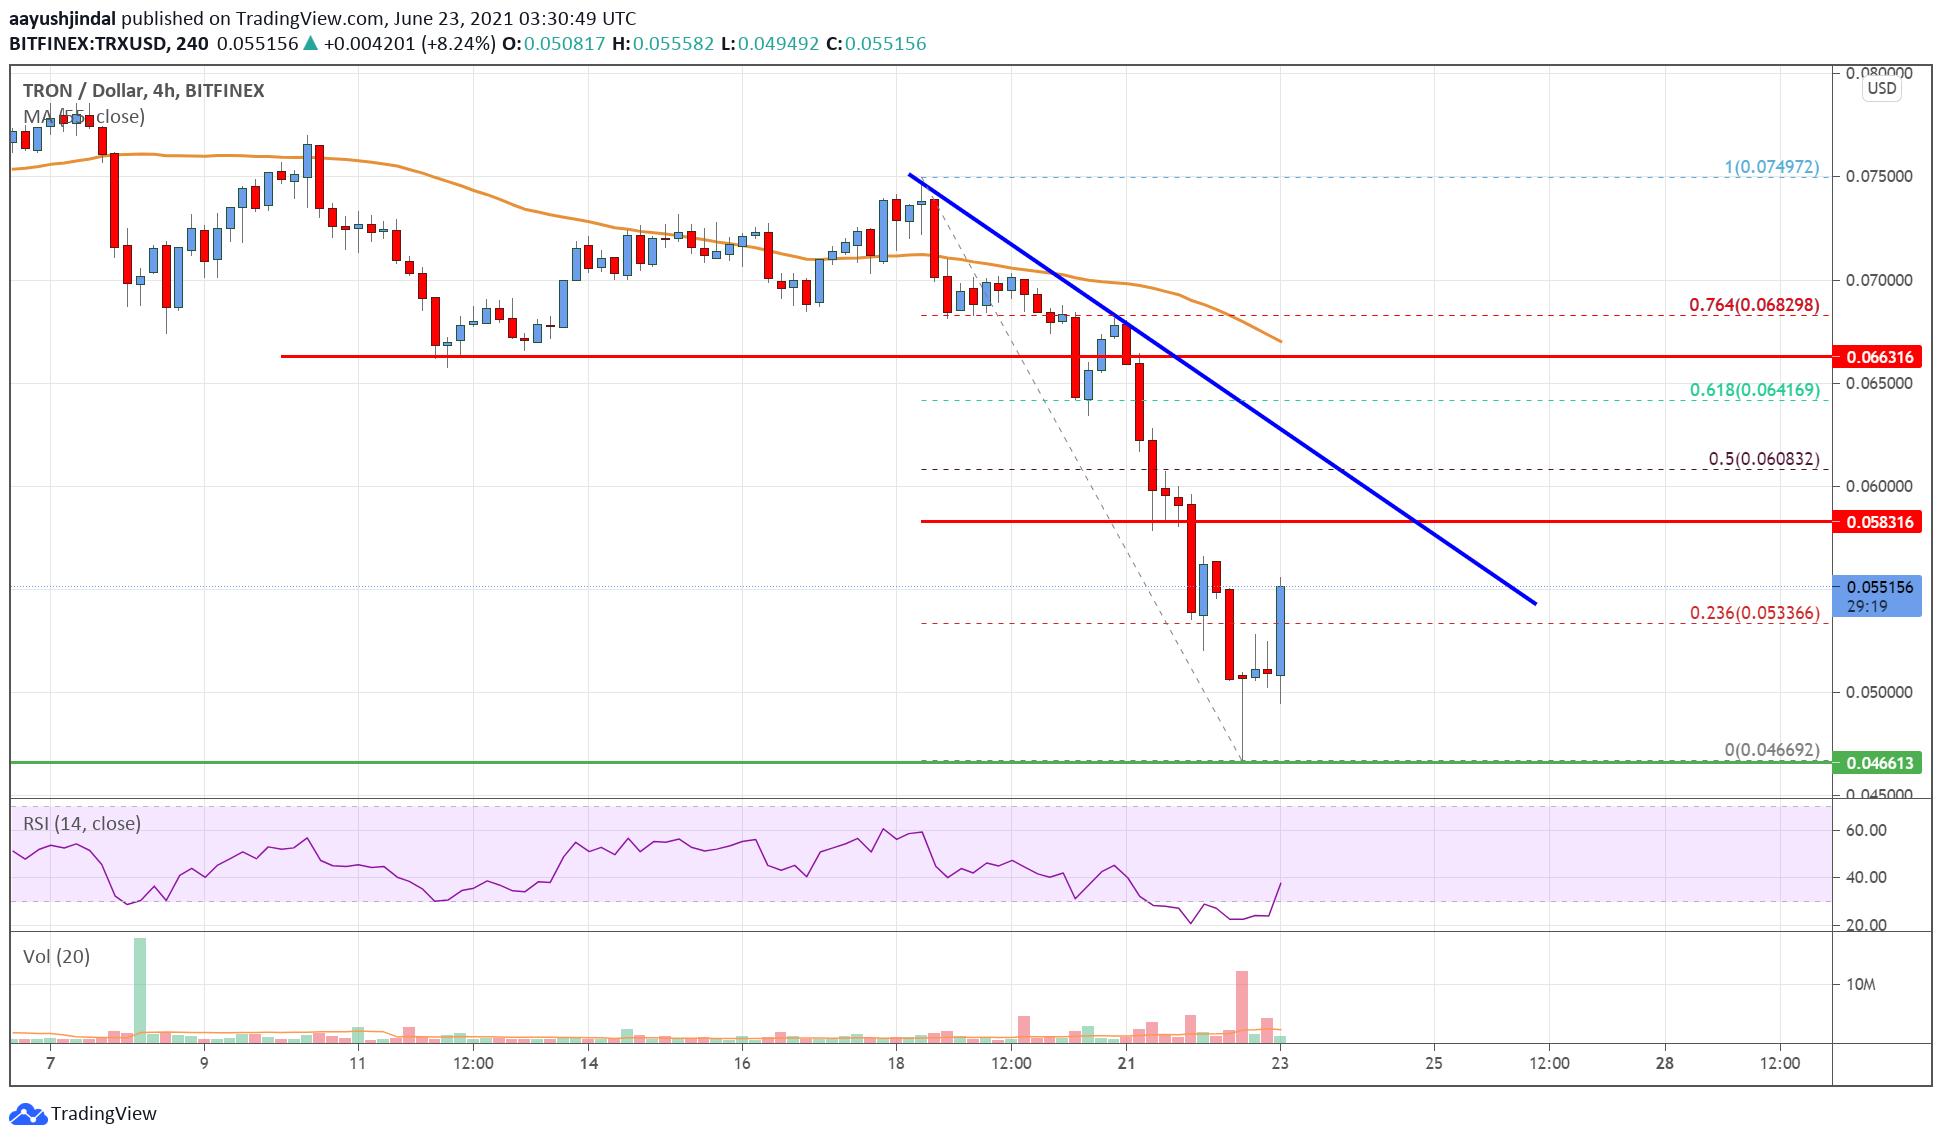 Tron (TRX) Price Analysis: Bulls Could Face Resistance Near $0.06 | Live Bitcoin News